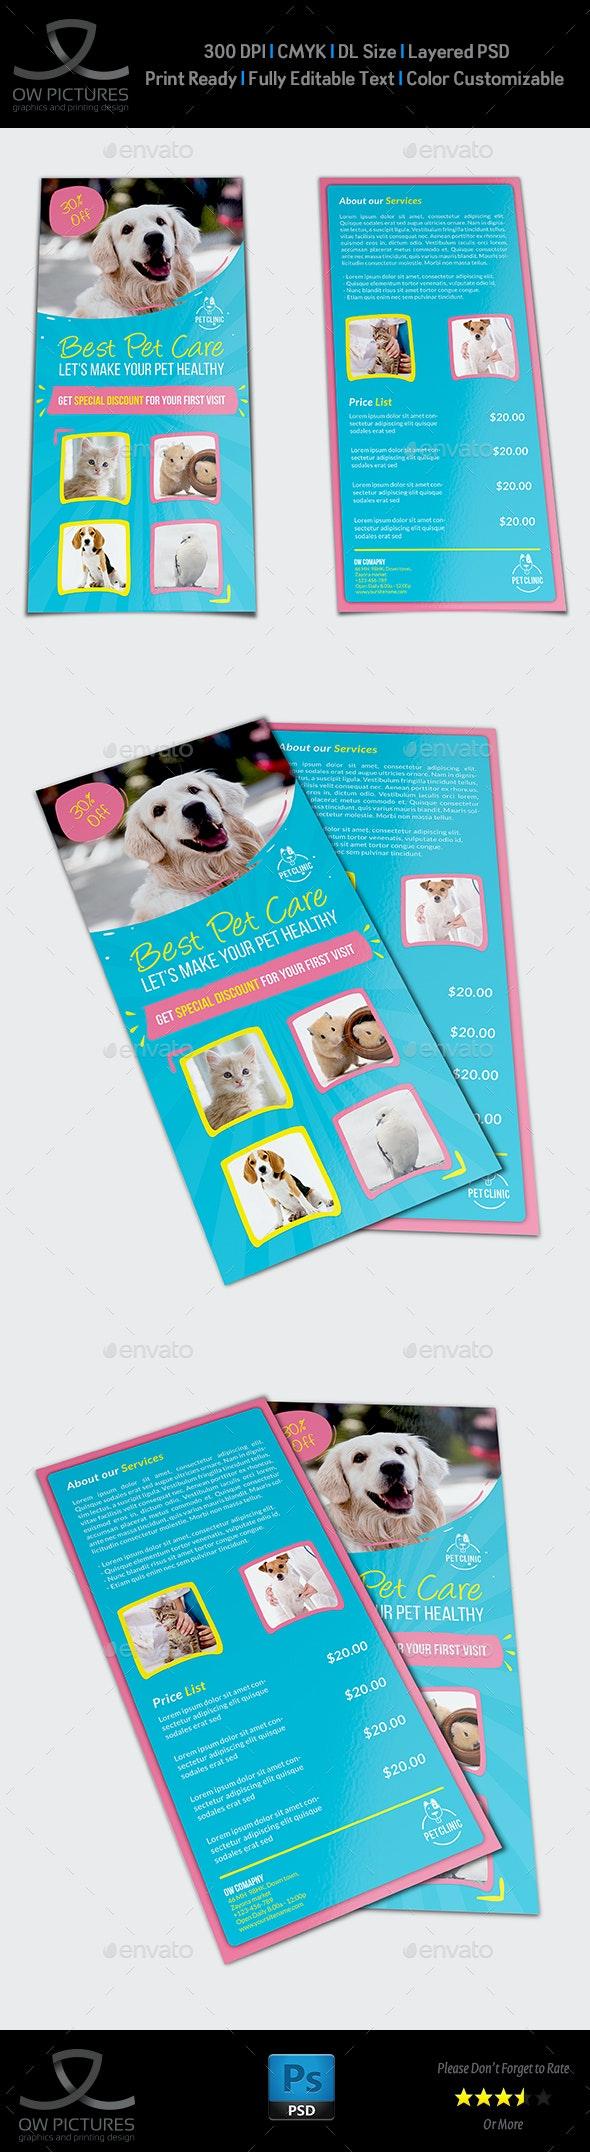 Pet Care Center Flyer DL Size Template - Flyers Print Templates